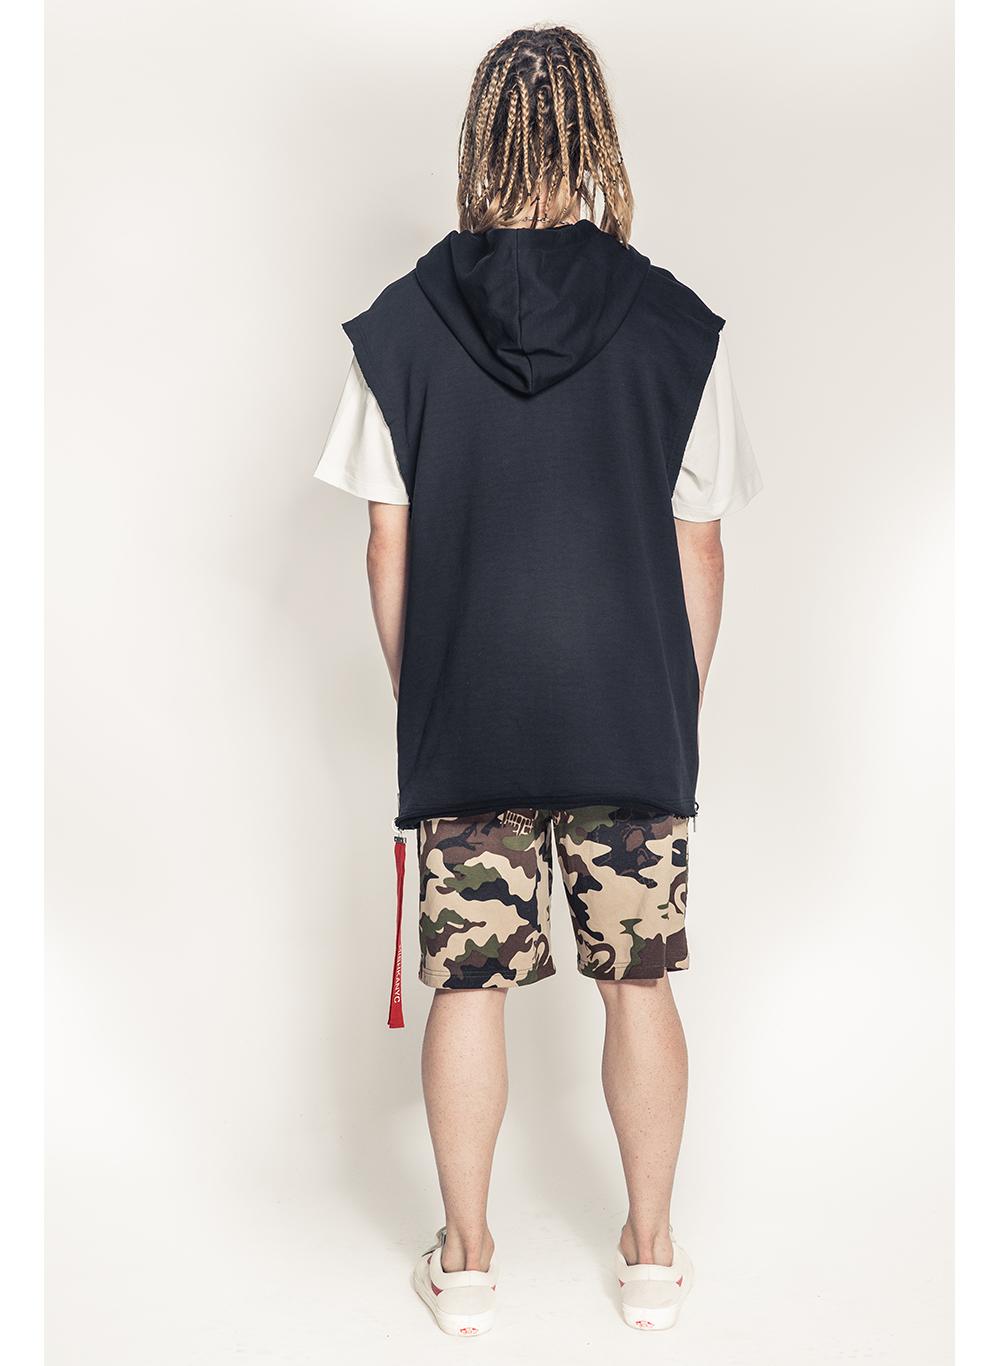 Lamour Split Icons Sleeveless Pullover Hoody